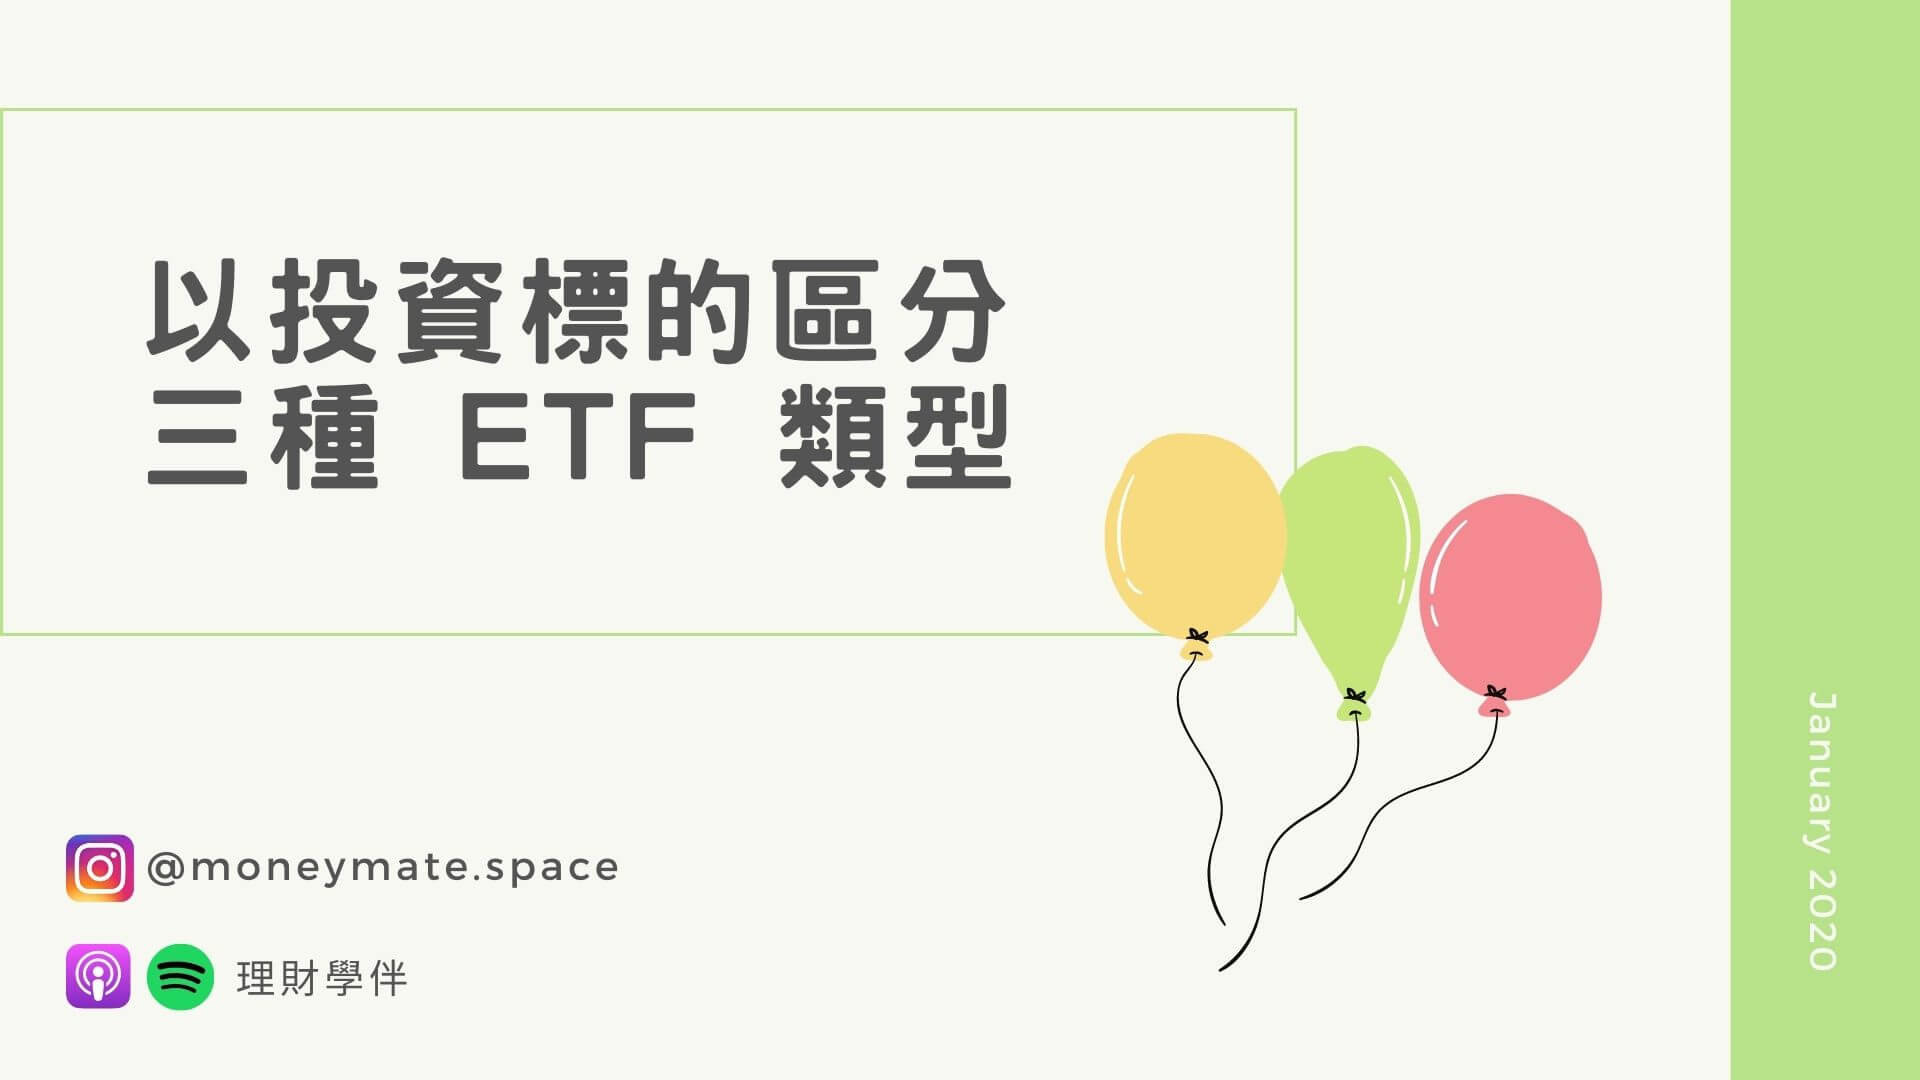 ETF 投資標的